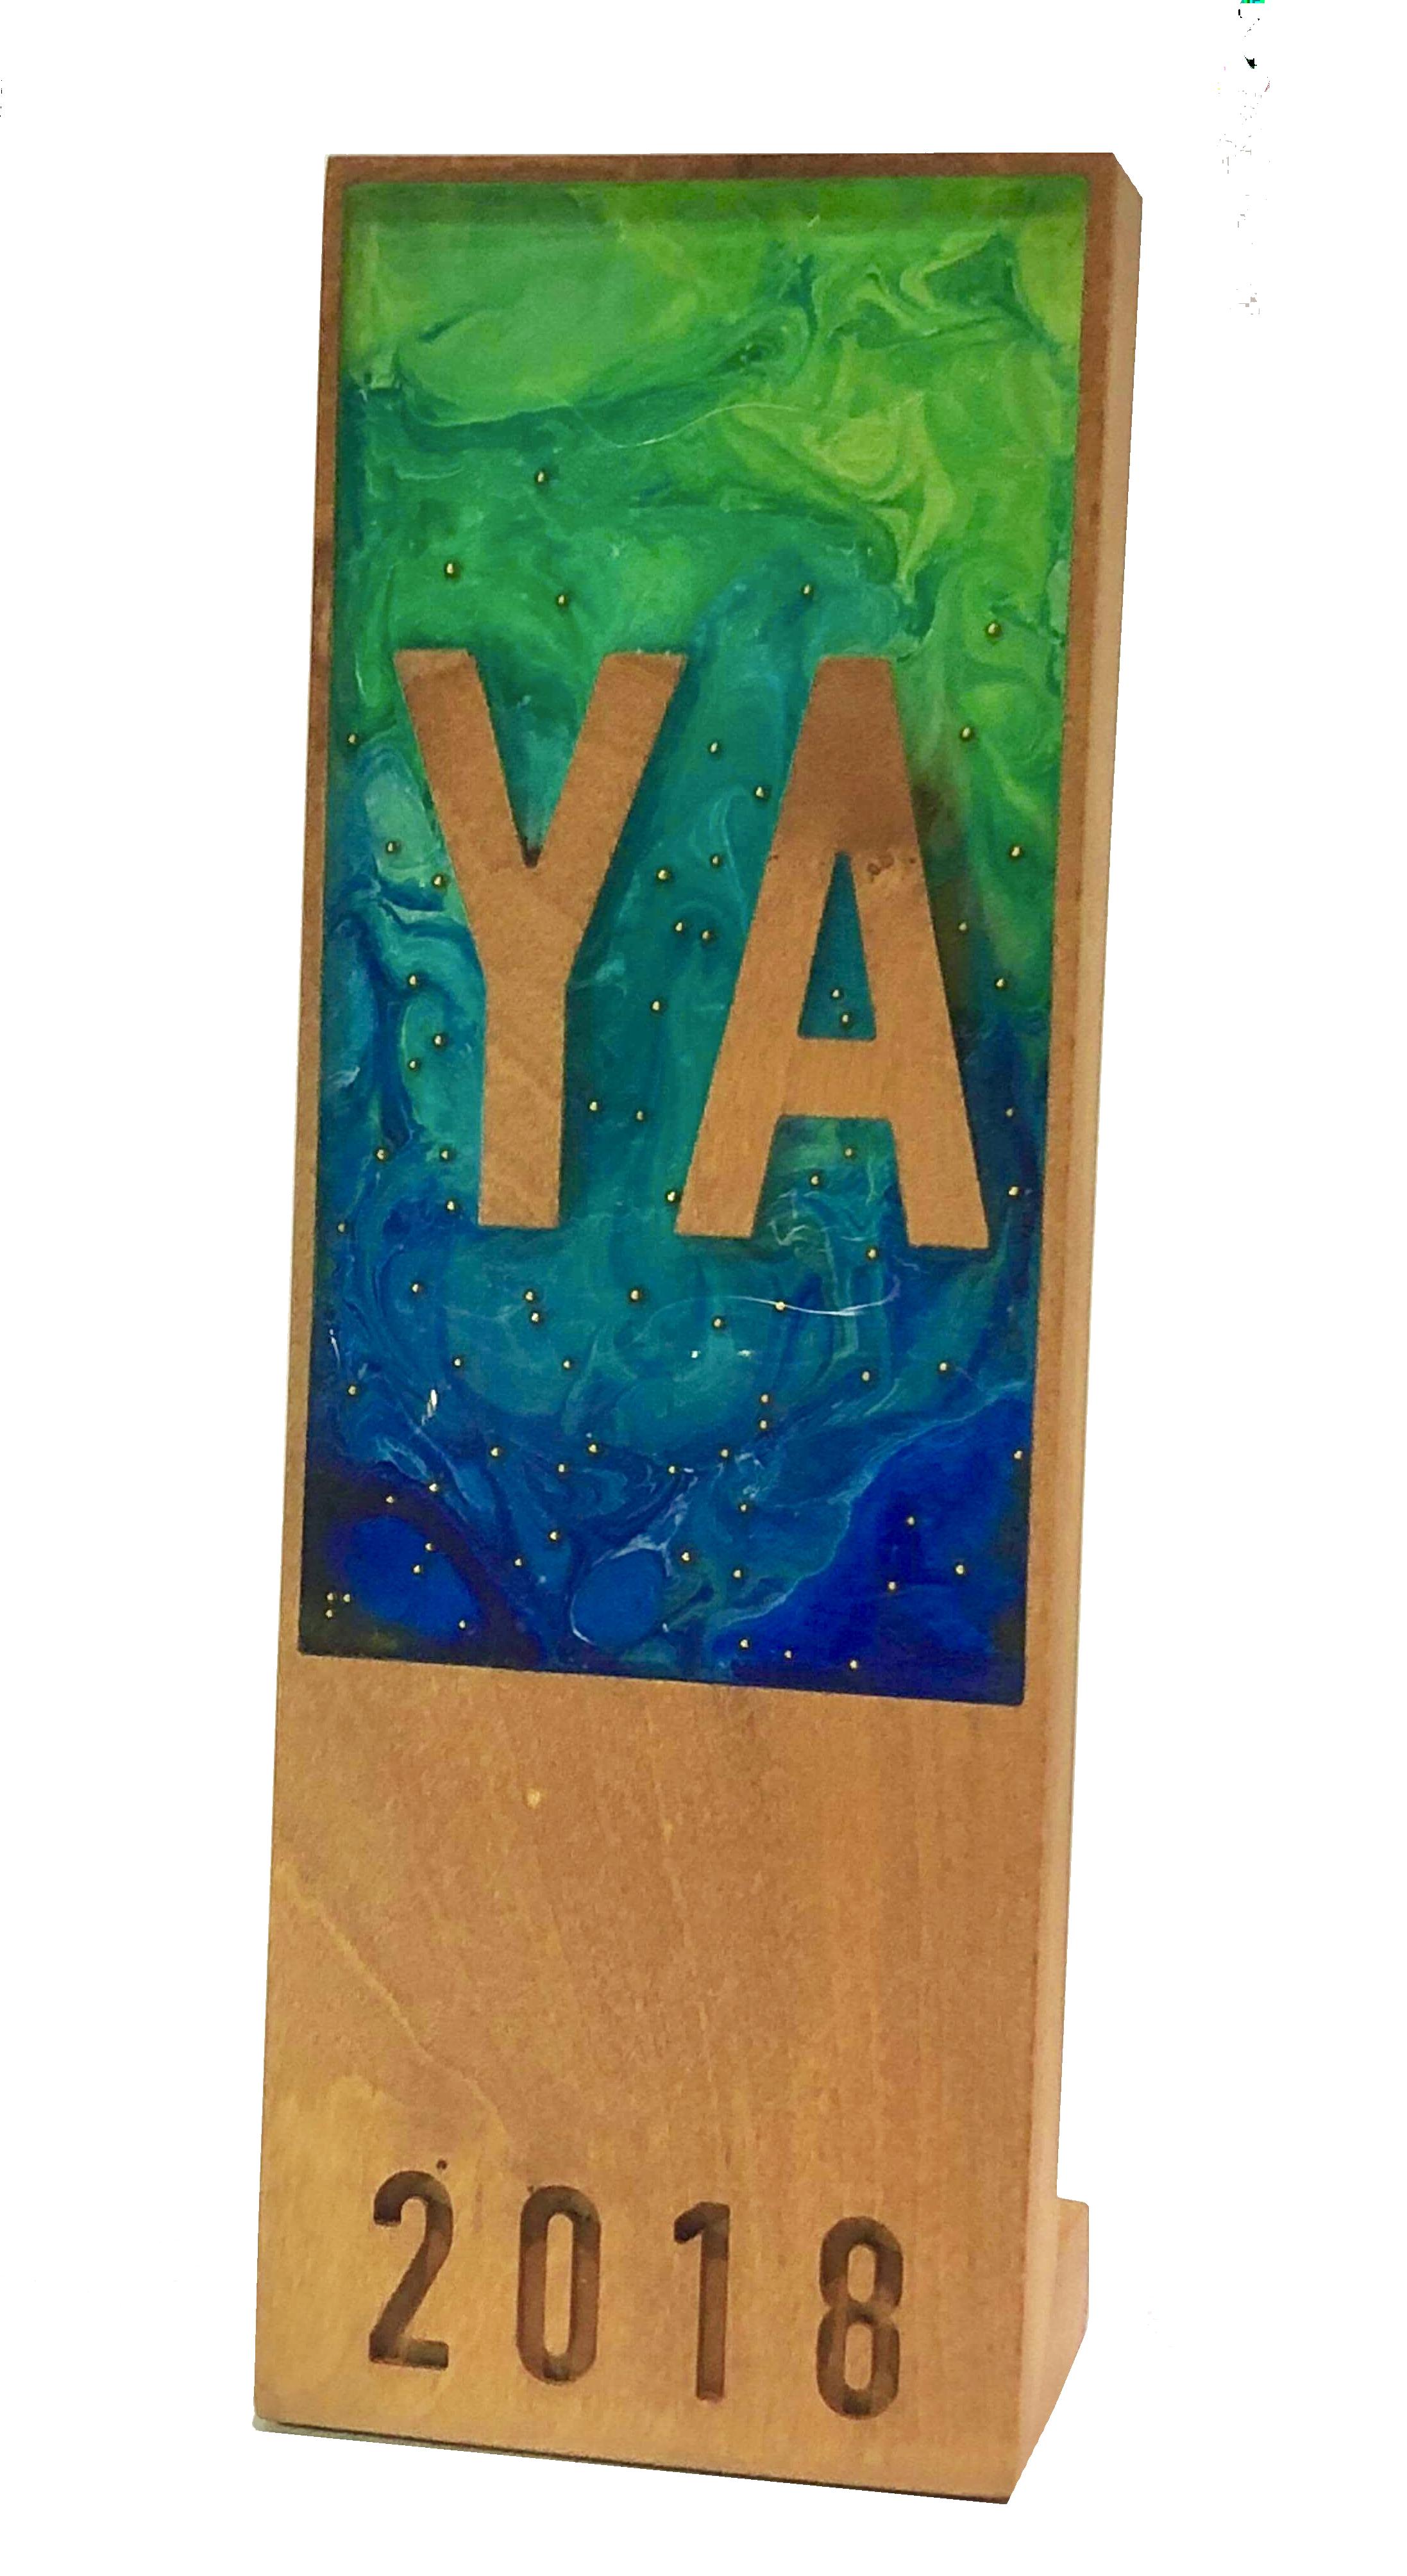 2018 YA Award designed by Sara Felix (Sent by Sara Felix; photo by Ryan Guggenheim)